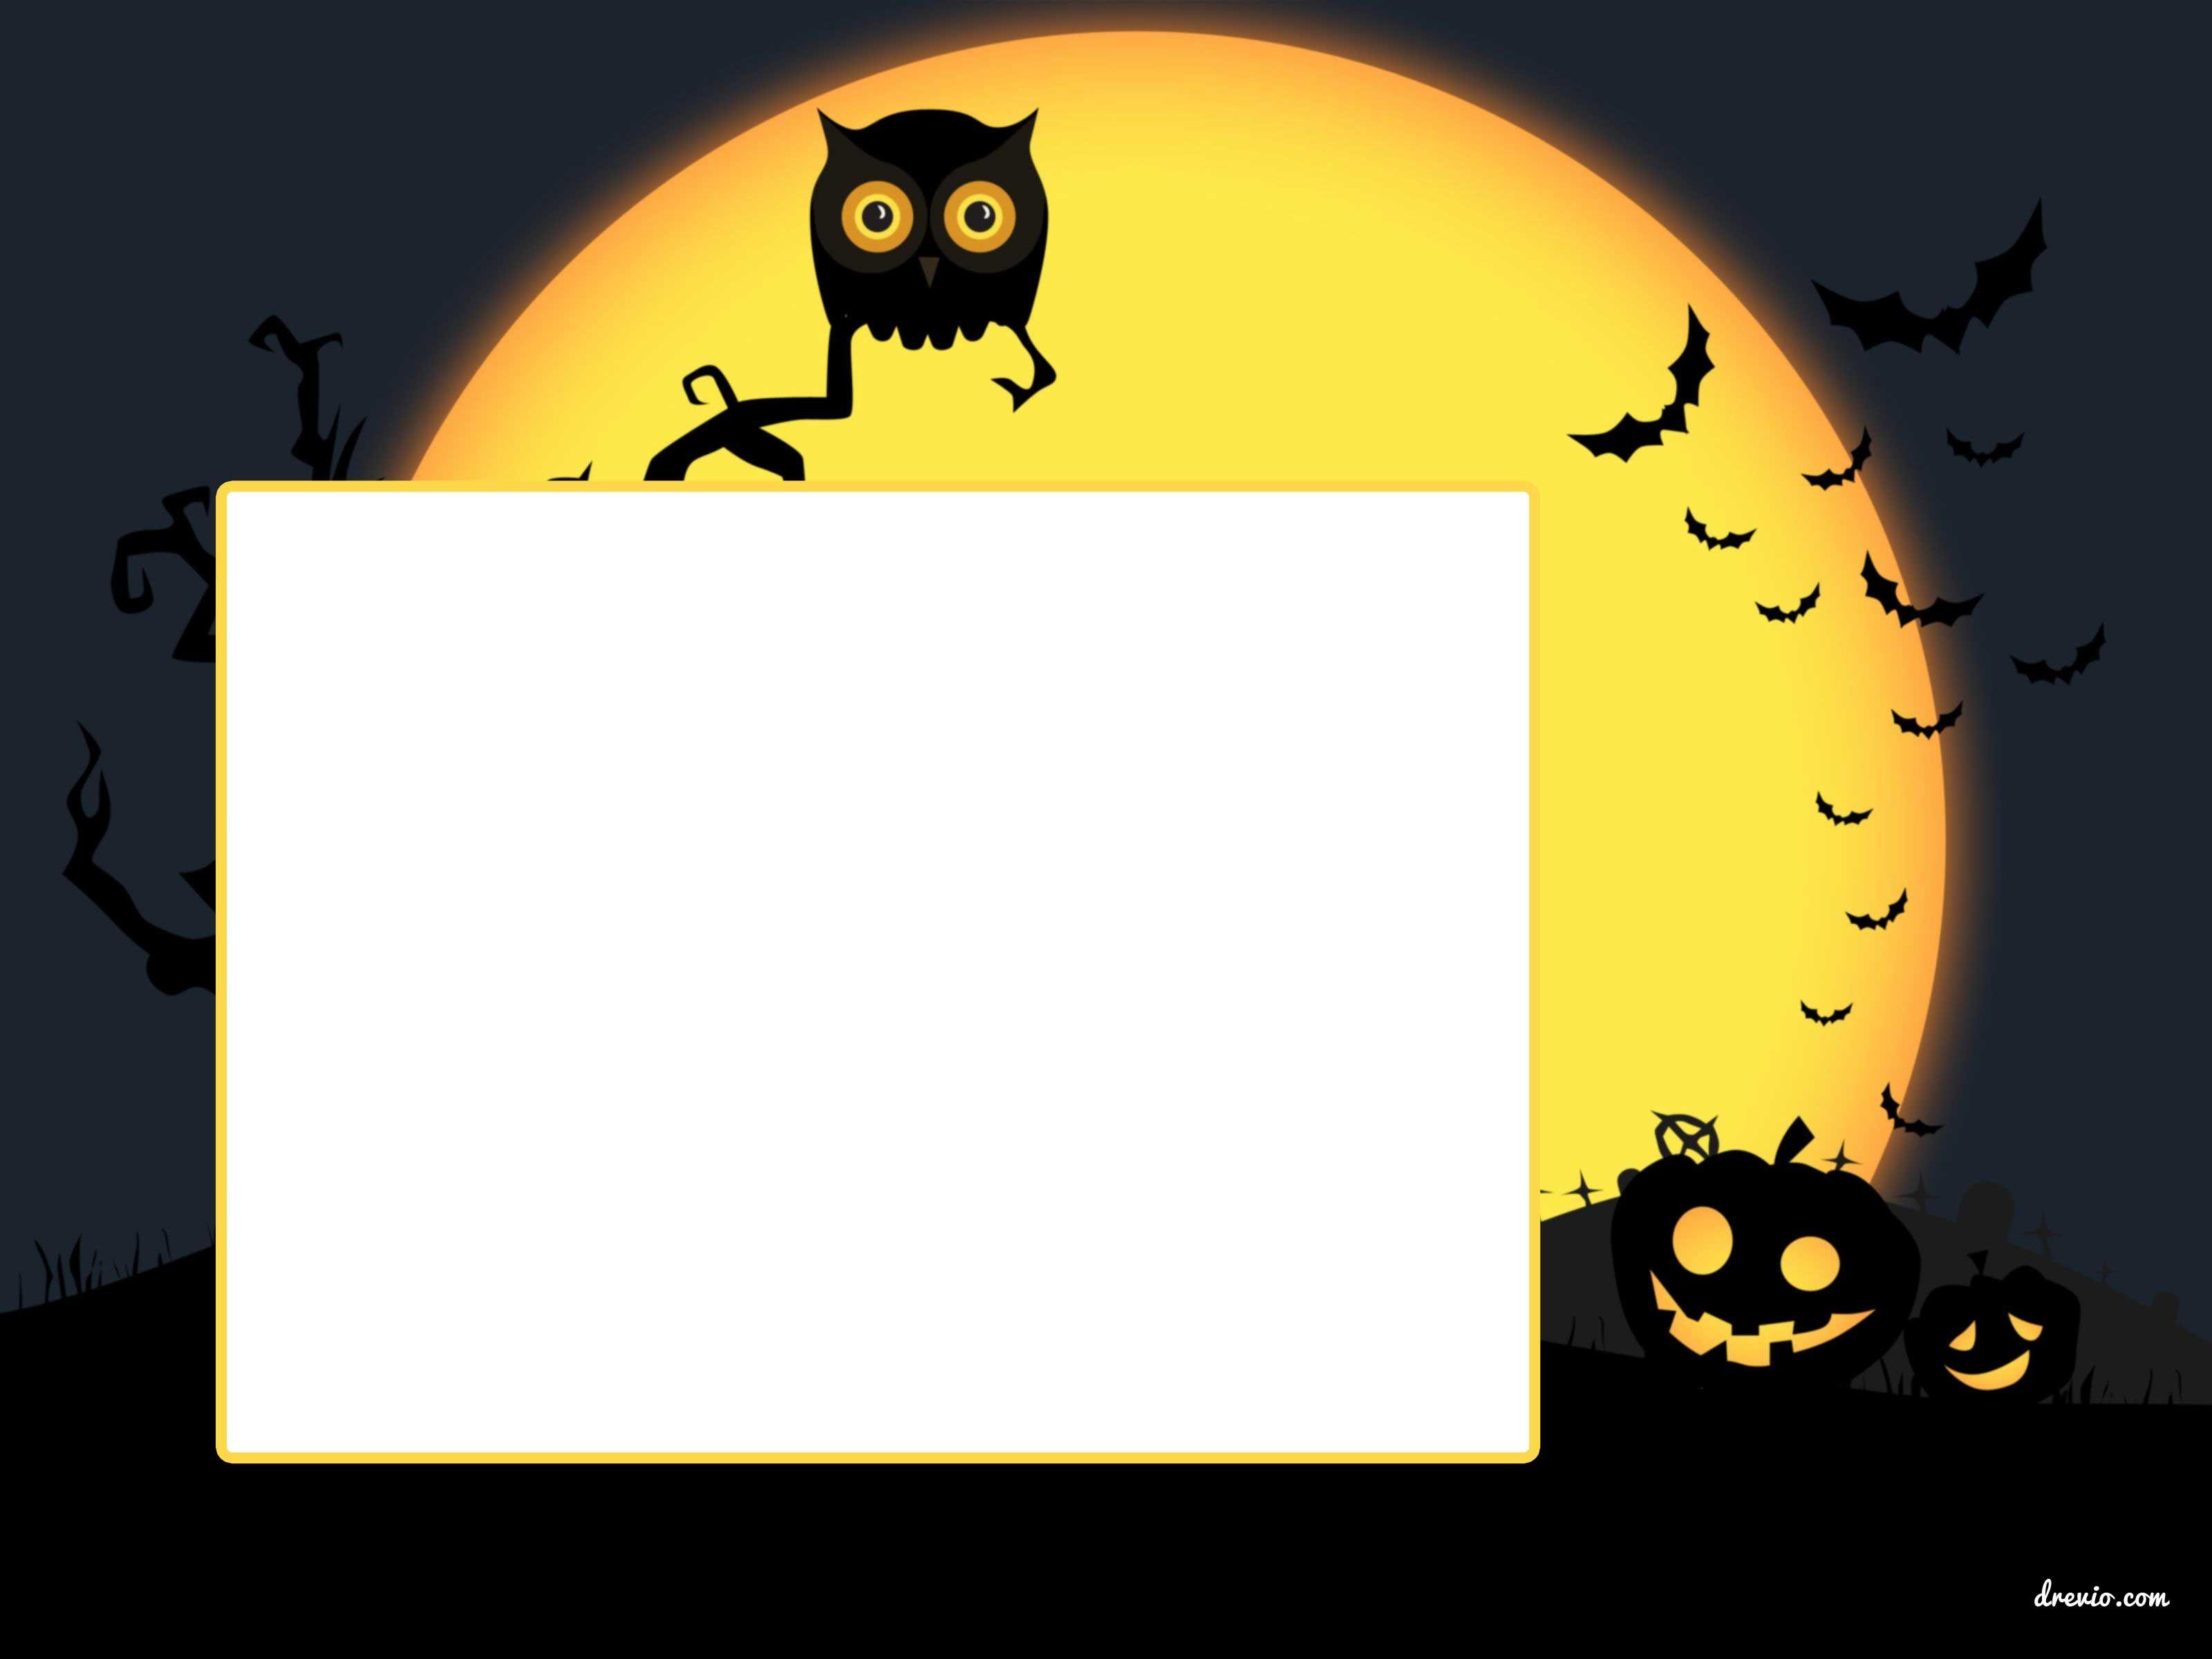 Free Printable Halloween Invitation Template It S Scary Yet Fun Printable Halloween Invitations Free Printable Halloween Invitations Halloween Invitation Template